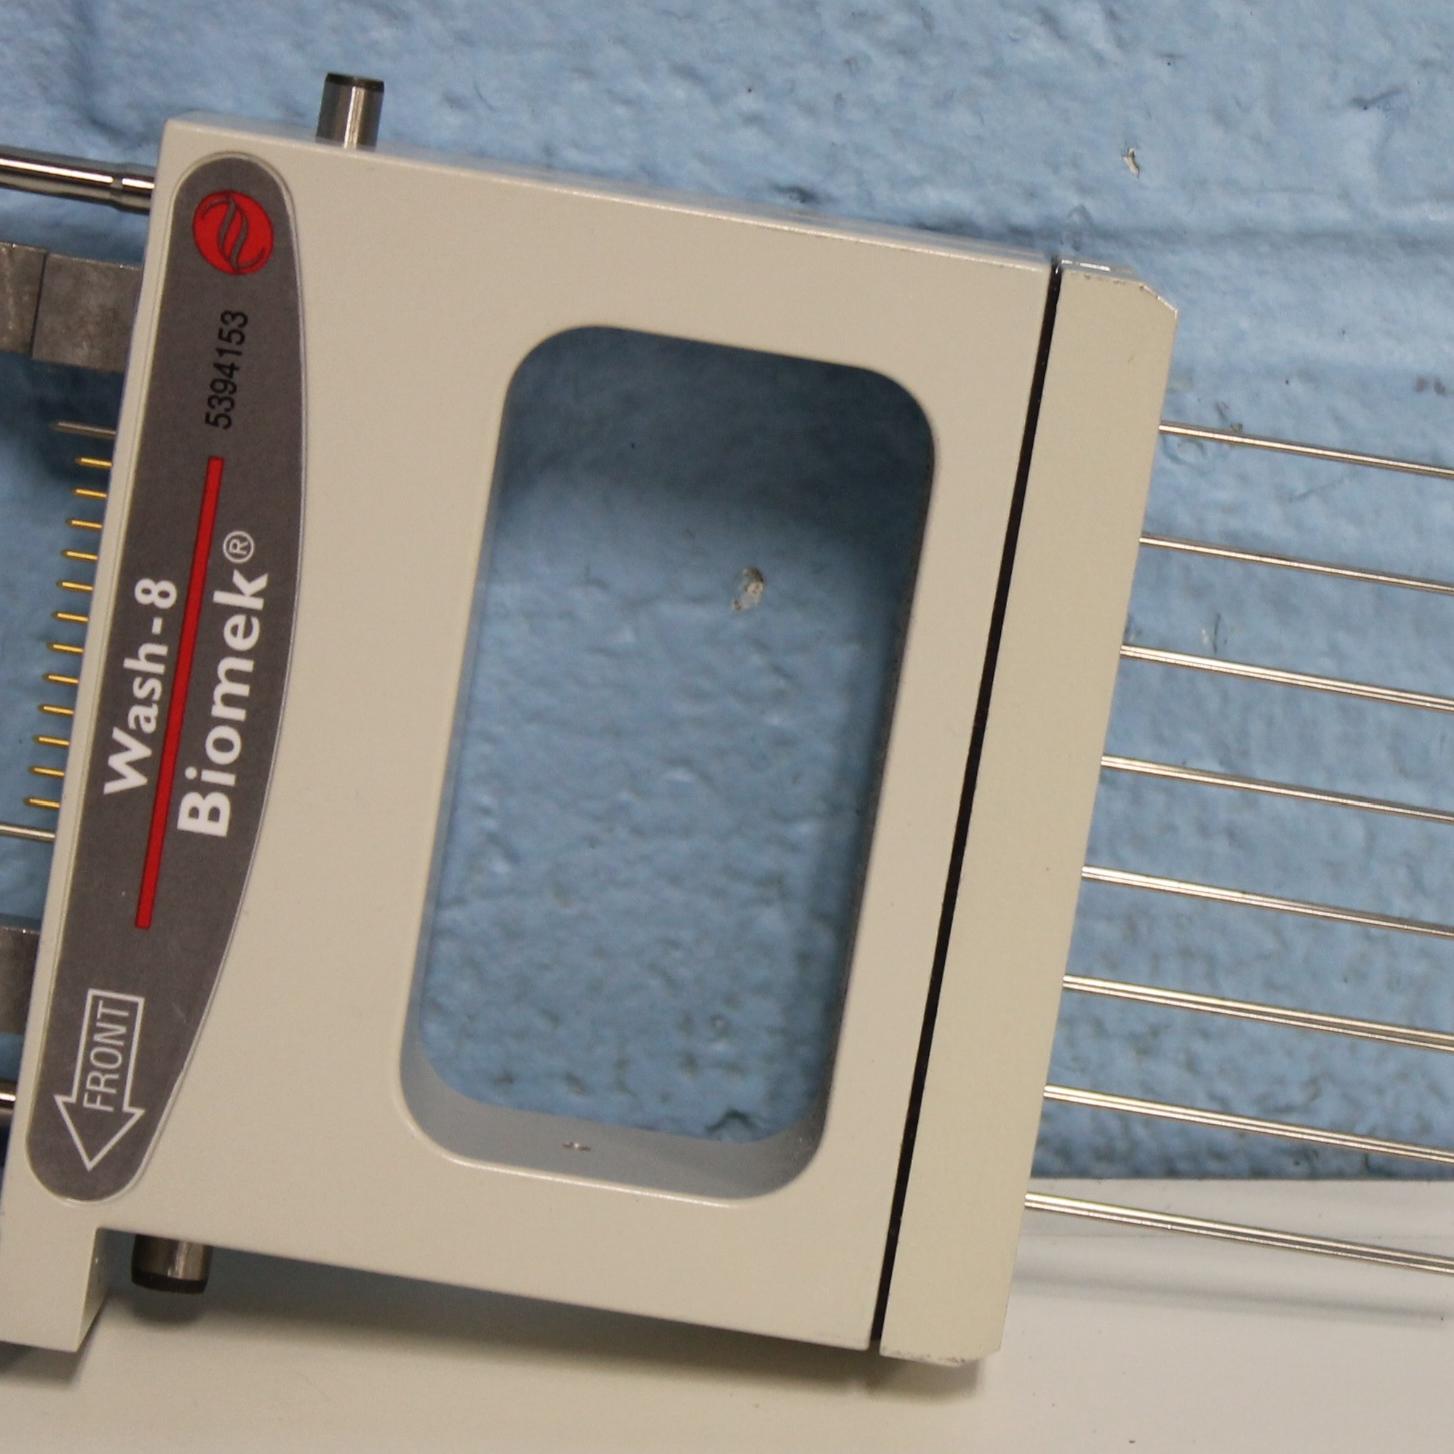 Beckman Coulter Biomek 3000 Laboratory Automation Workstation Image